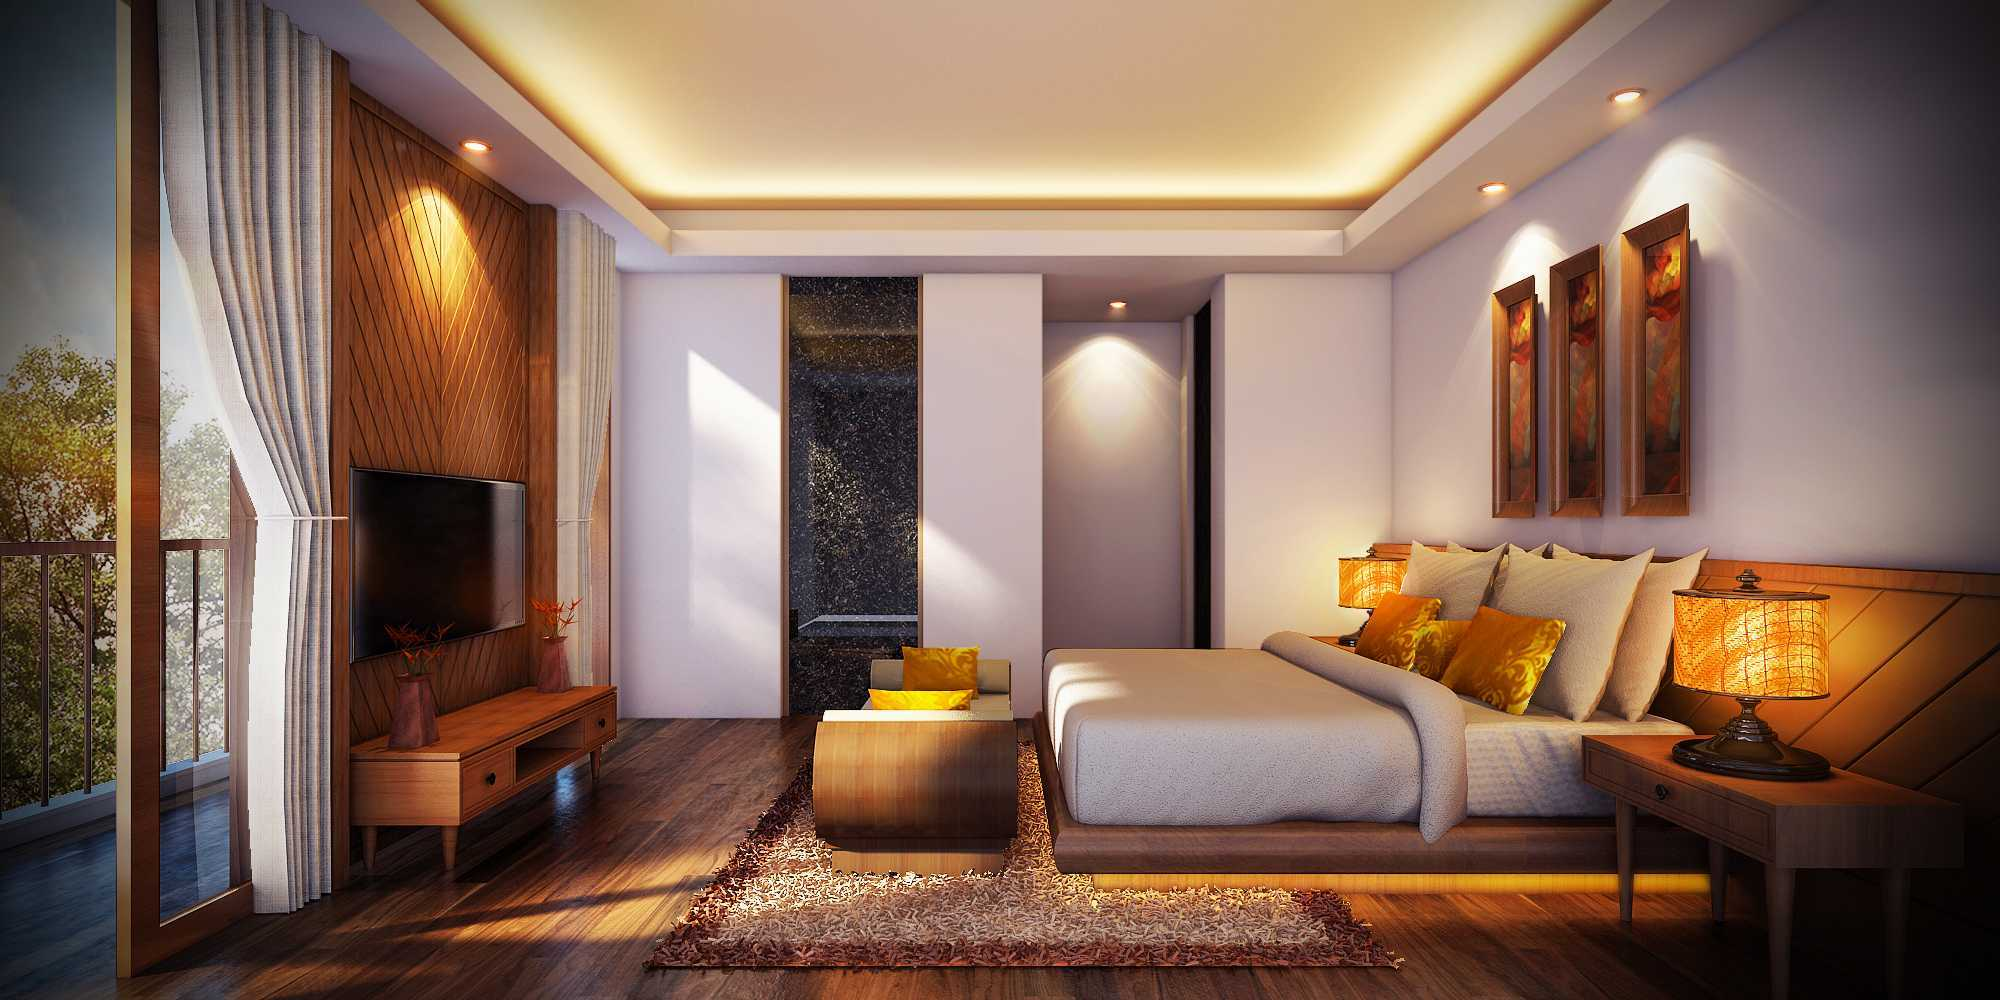 Icds Architect Pejeng Villa Bali Bali Guest-Bedroom   13930